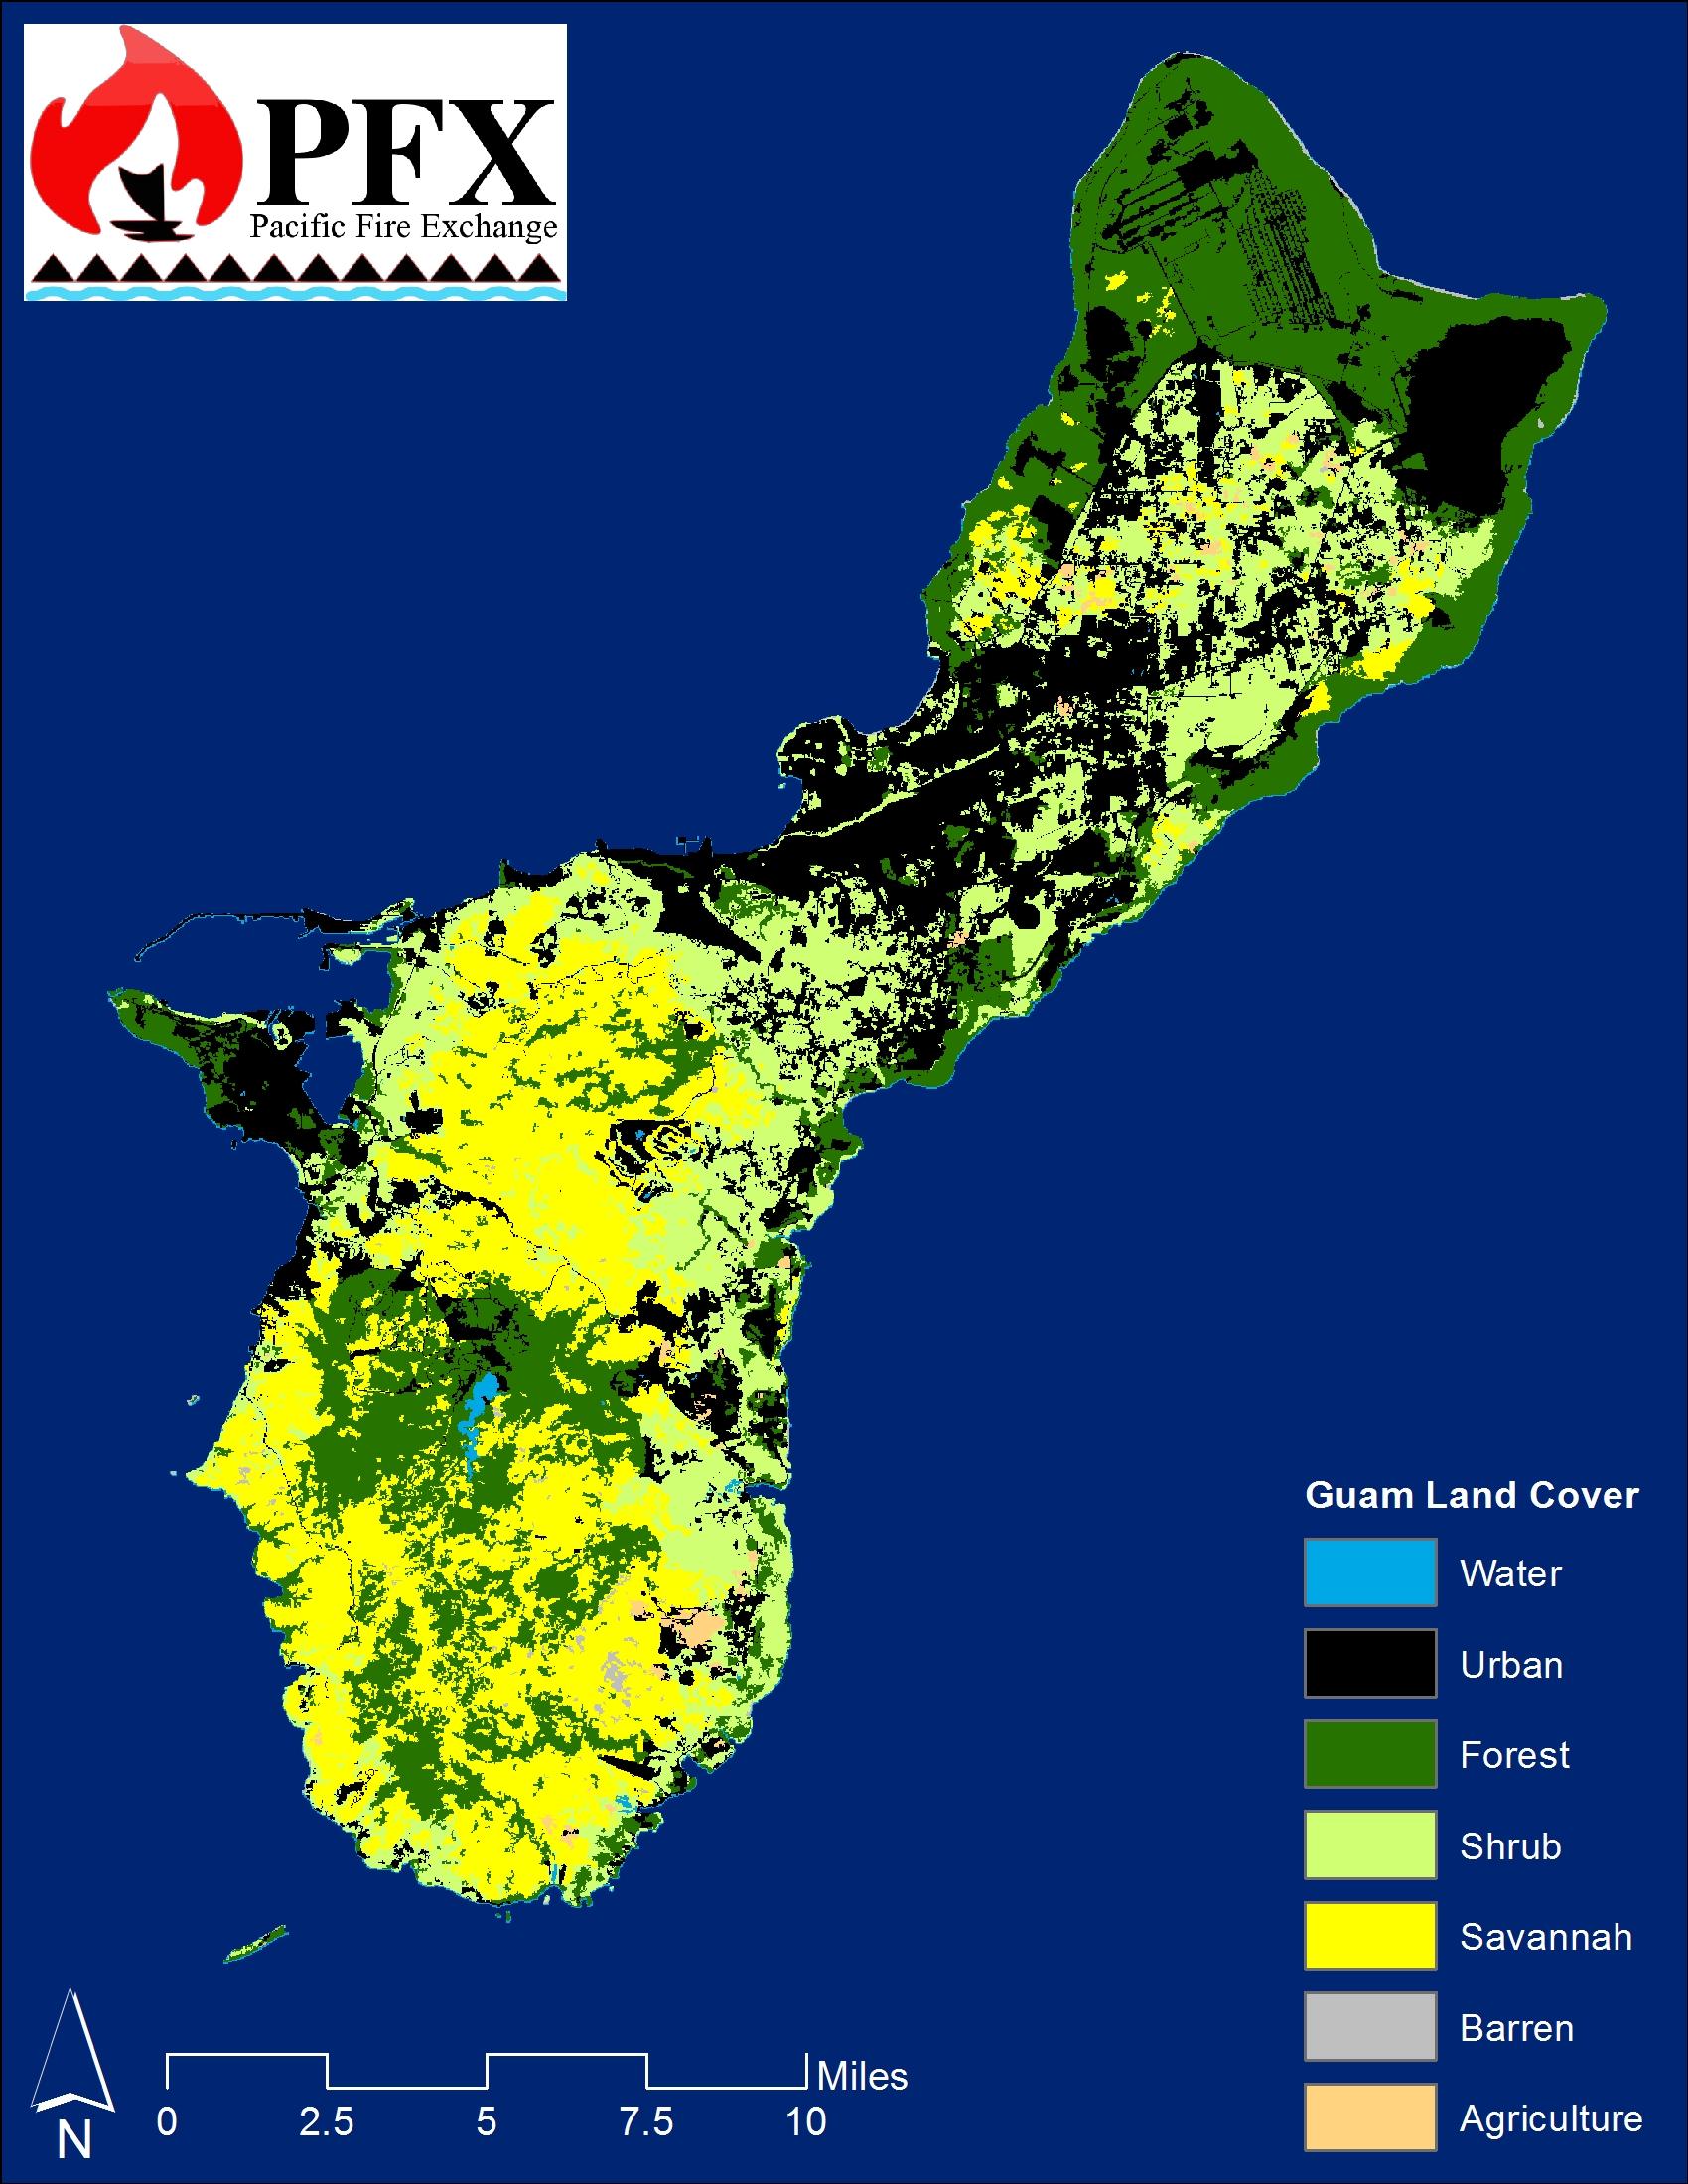 Guam Land Cover